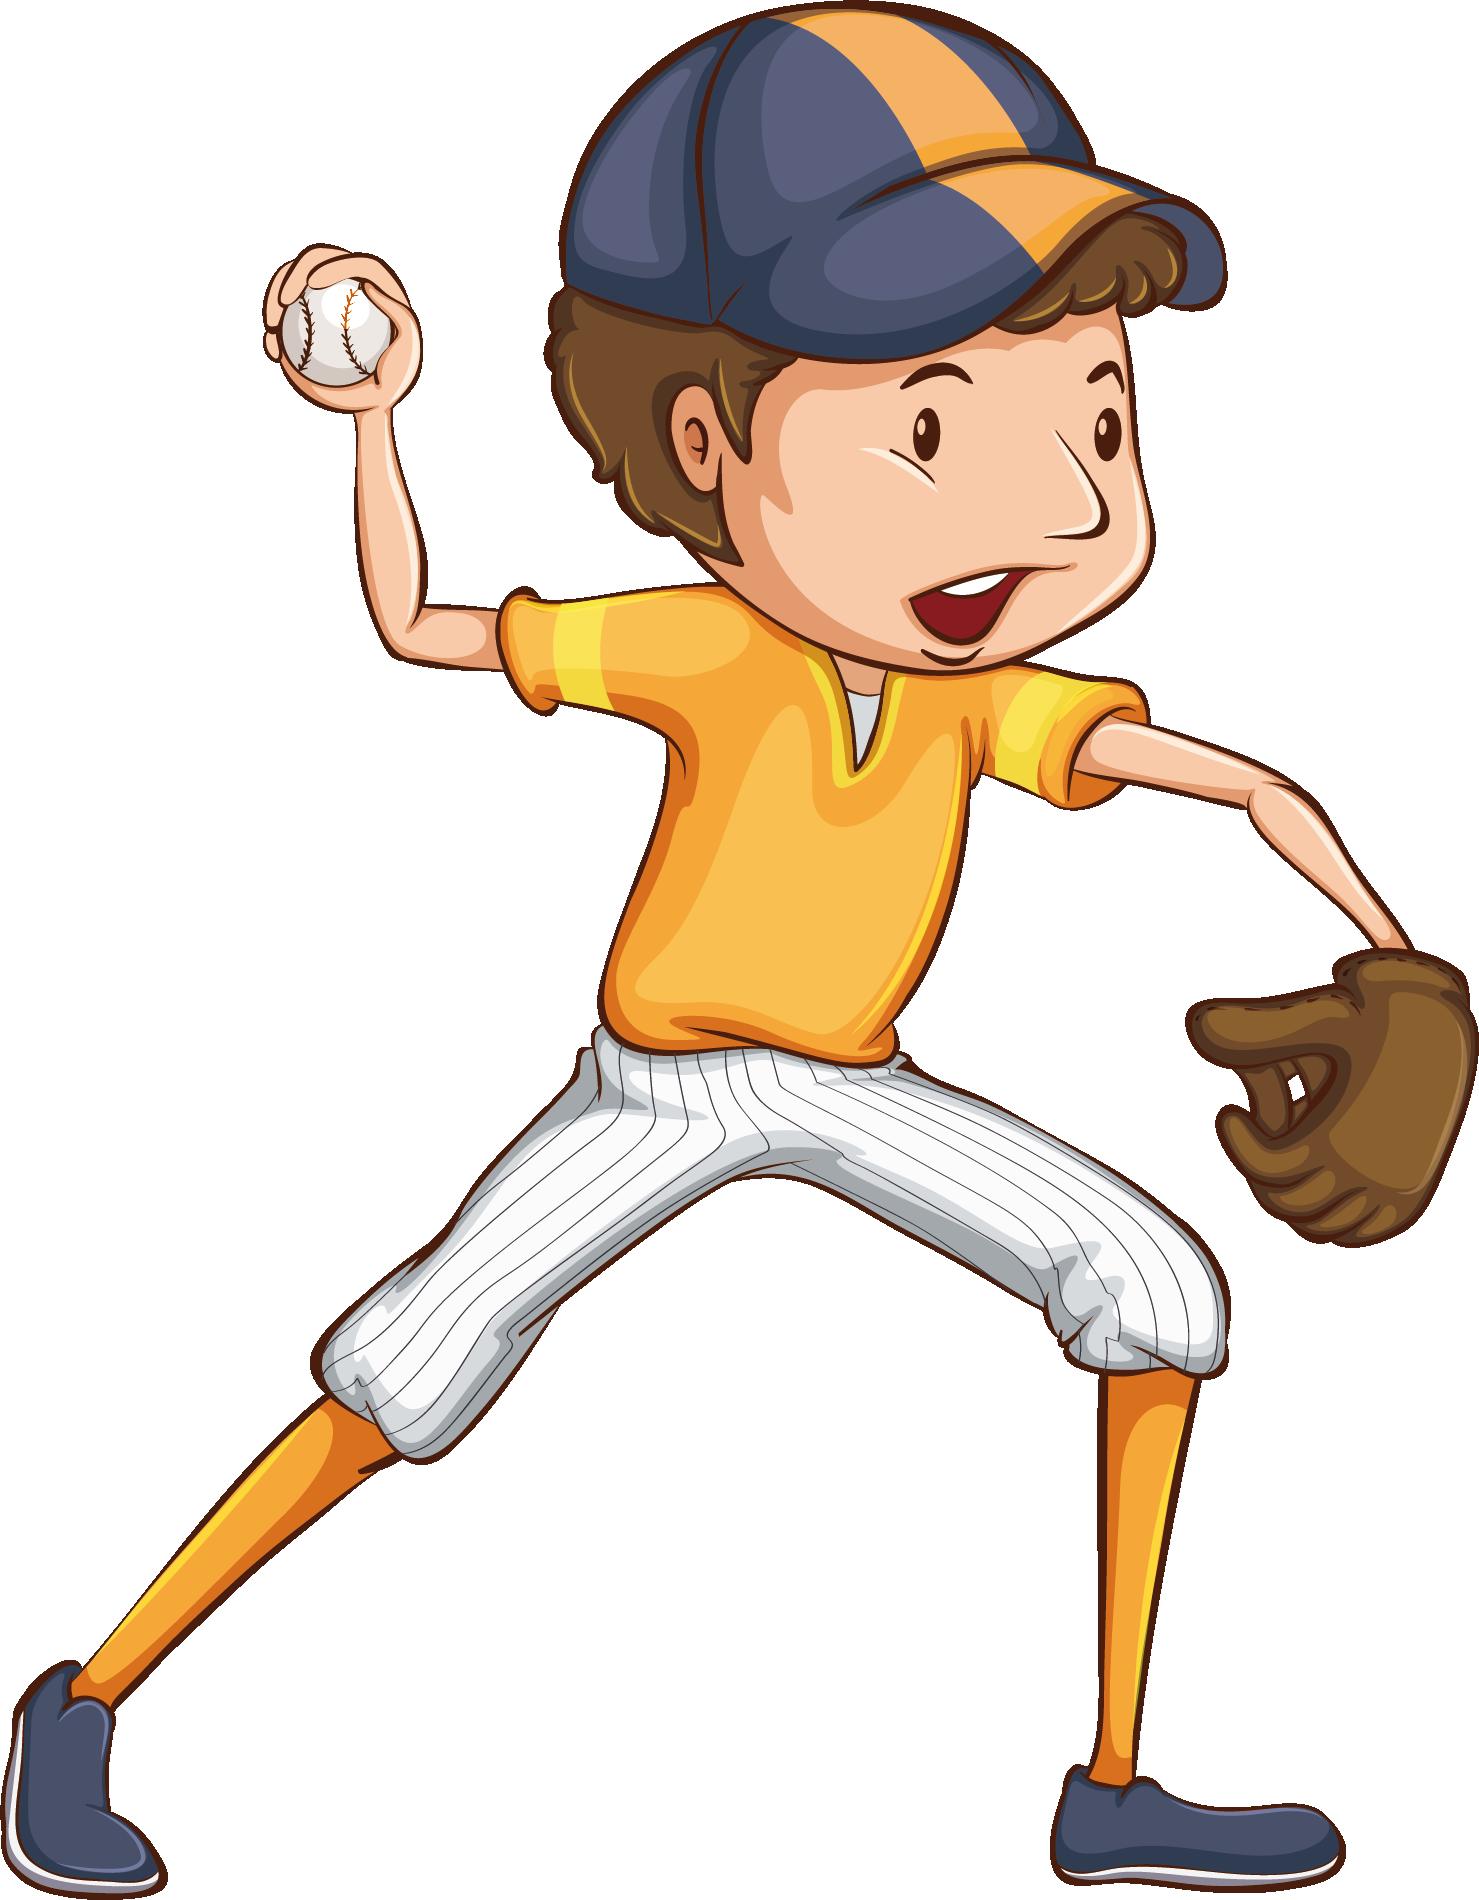 Ball cartoon illustration game. Games clipart baseball match